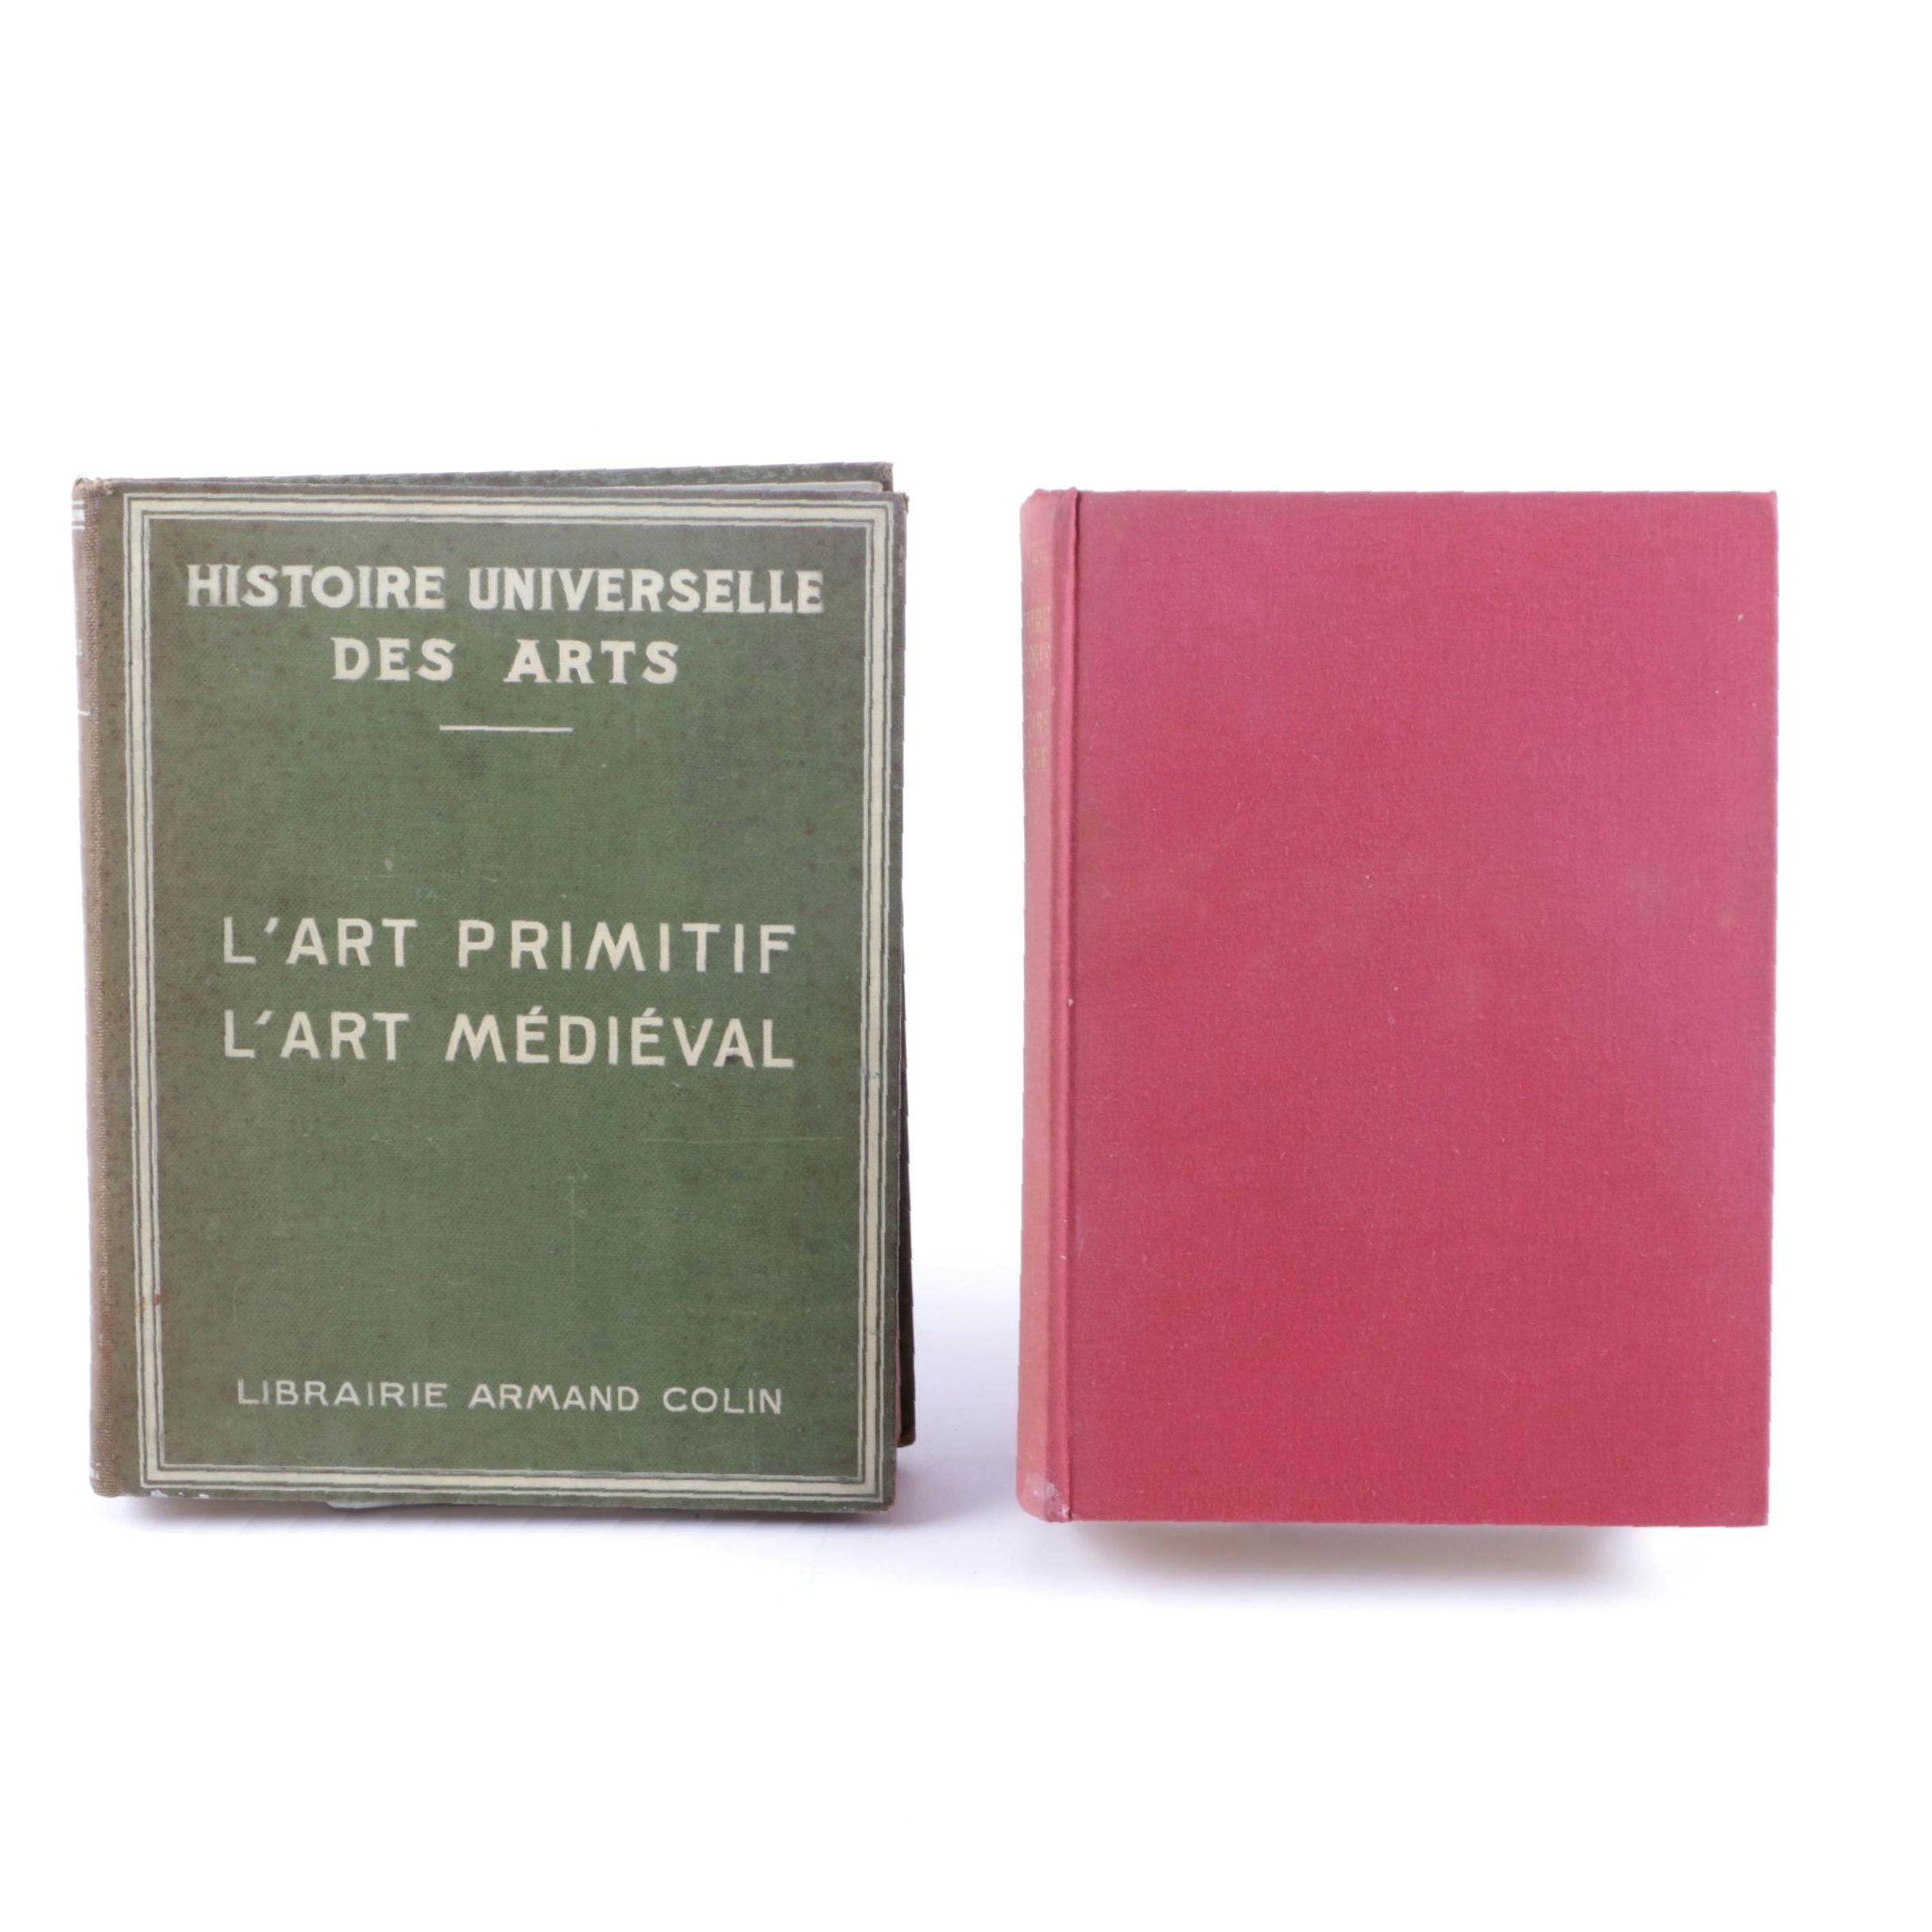 Vintage French-Language Art History Books